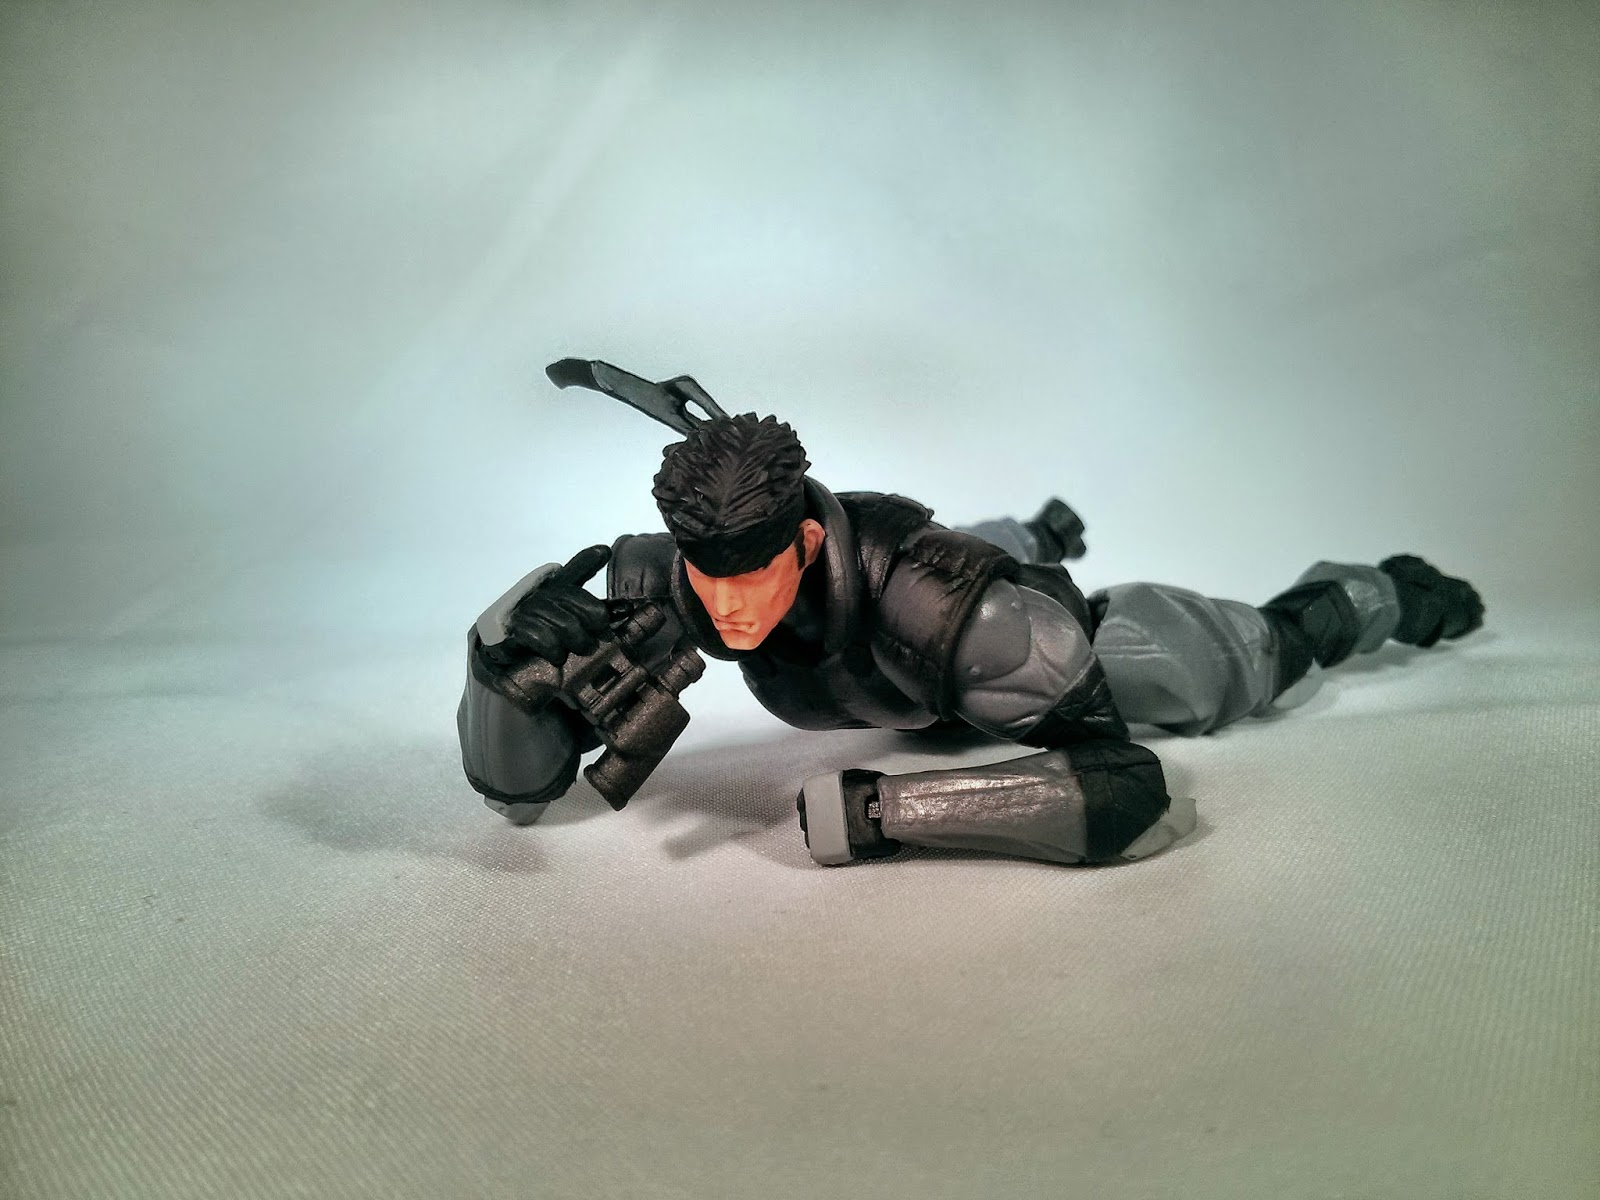 Snake with Binoculars